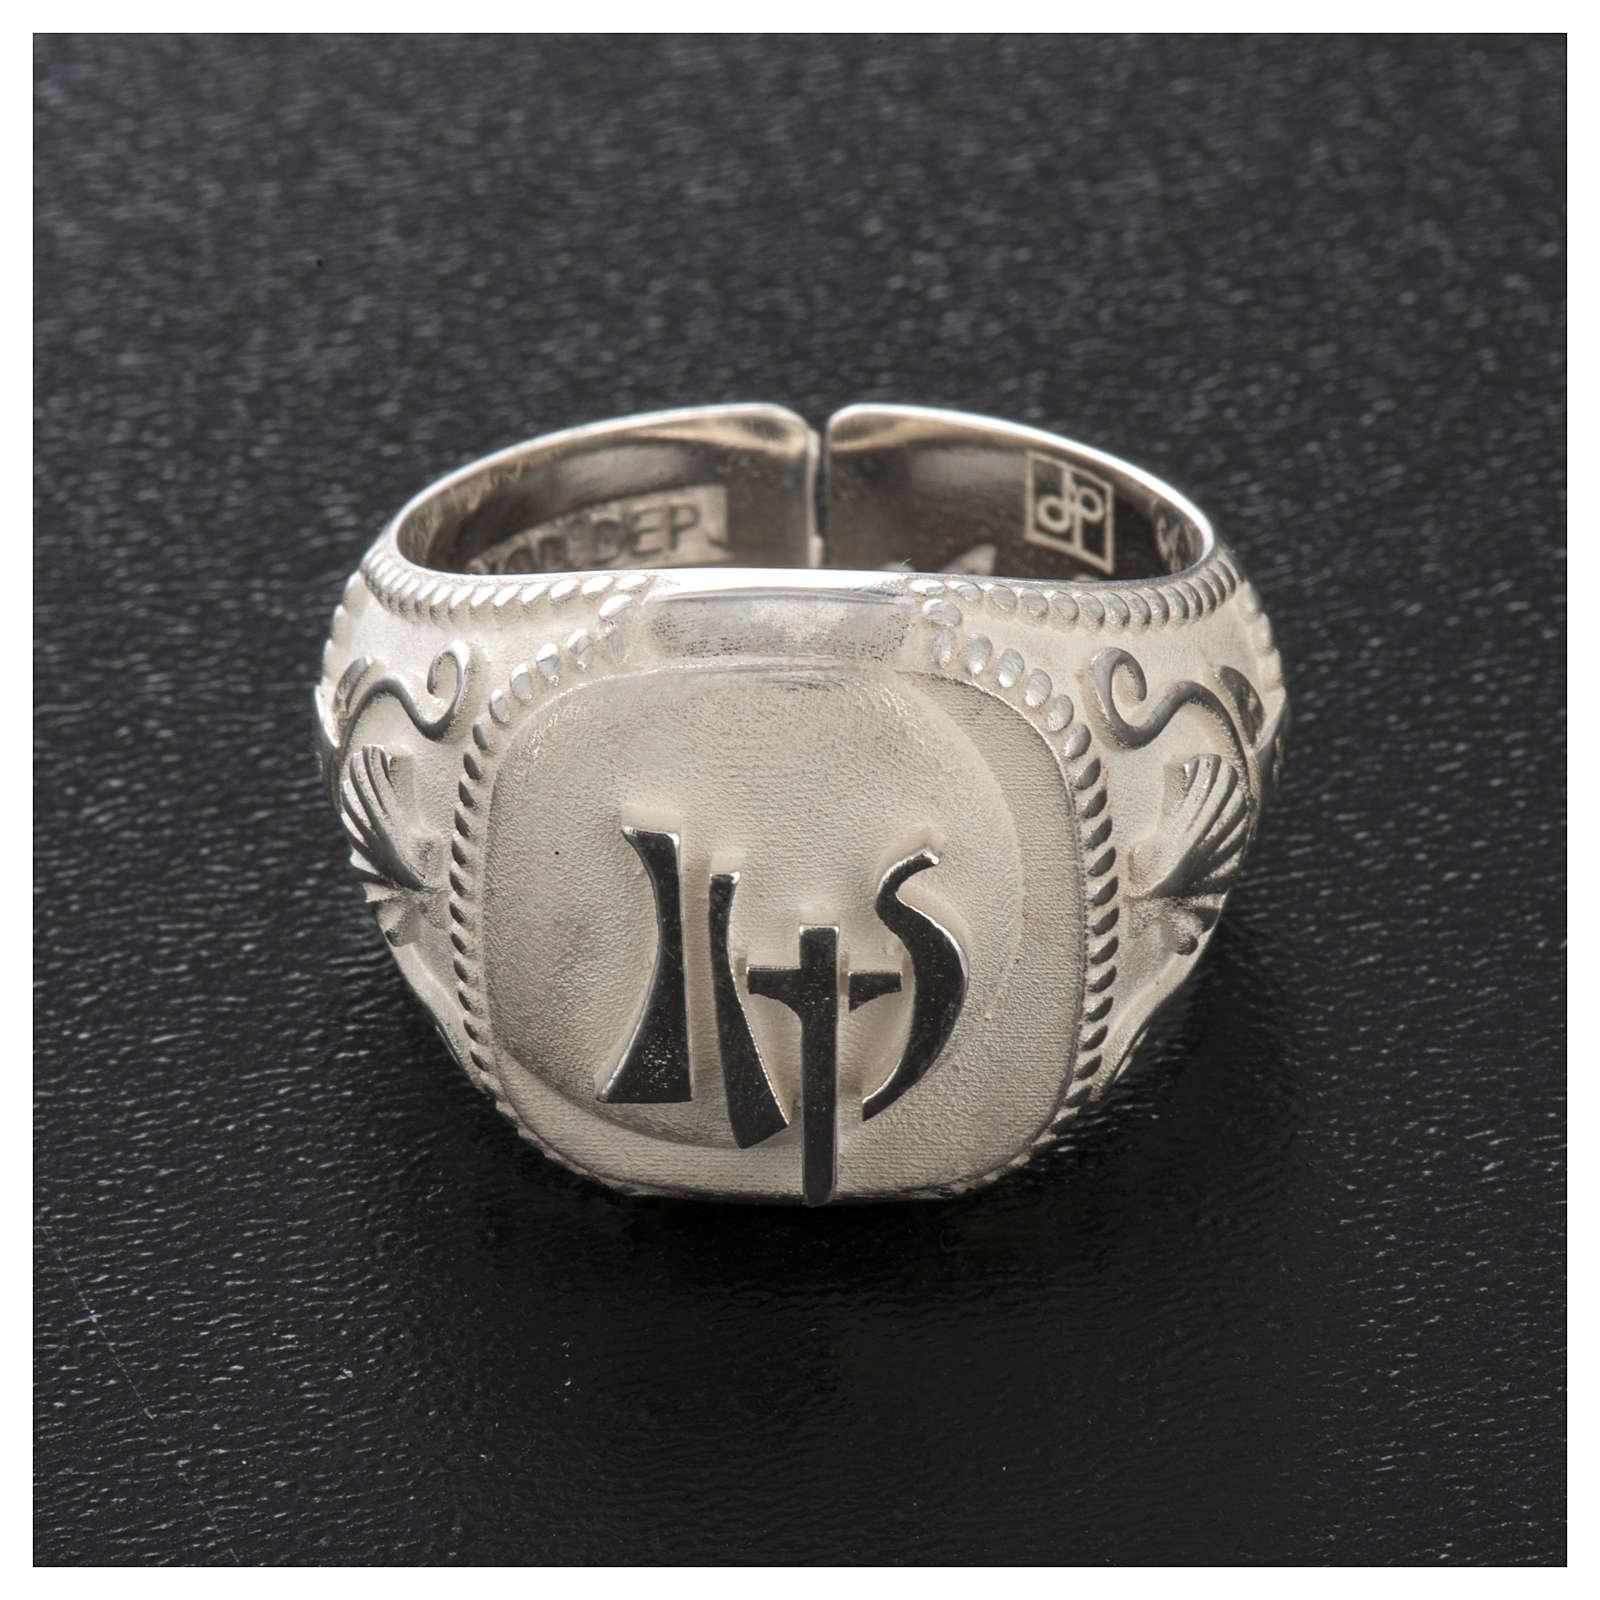 Bishop's ring, adjustable in sterling silver,